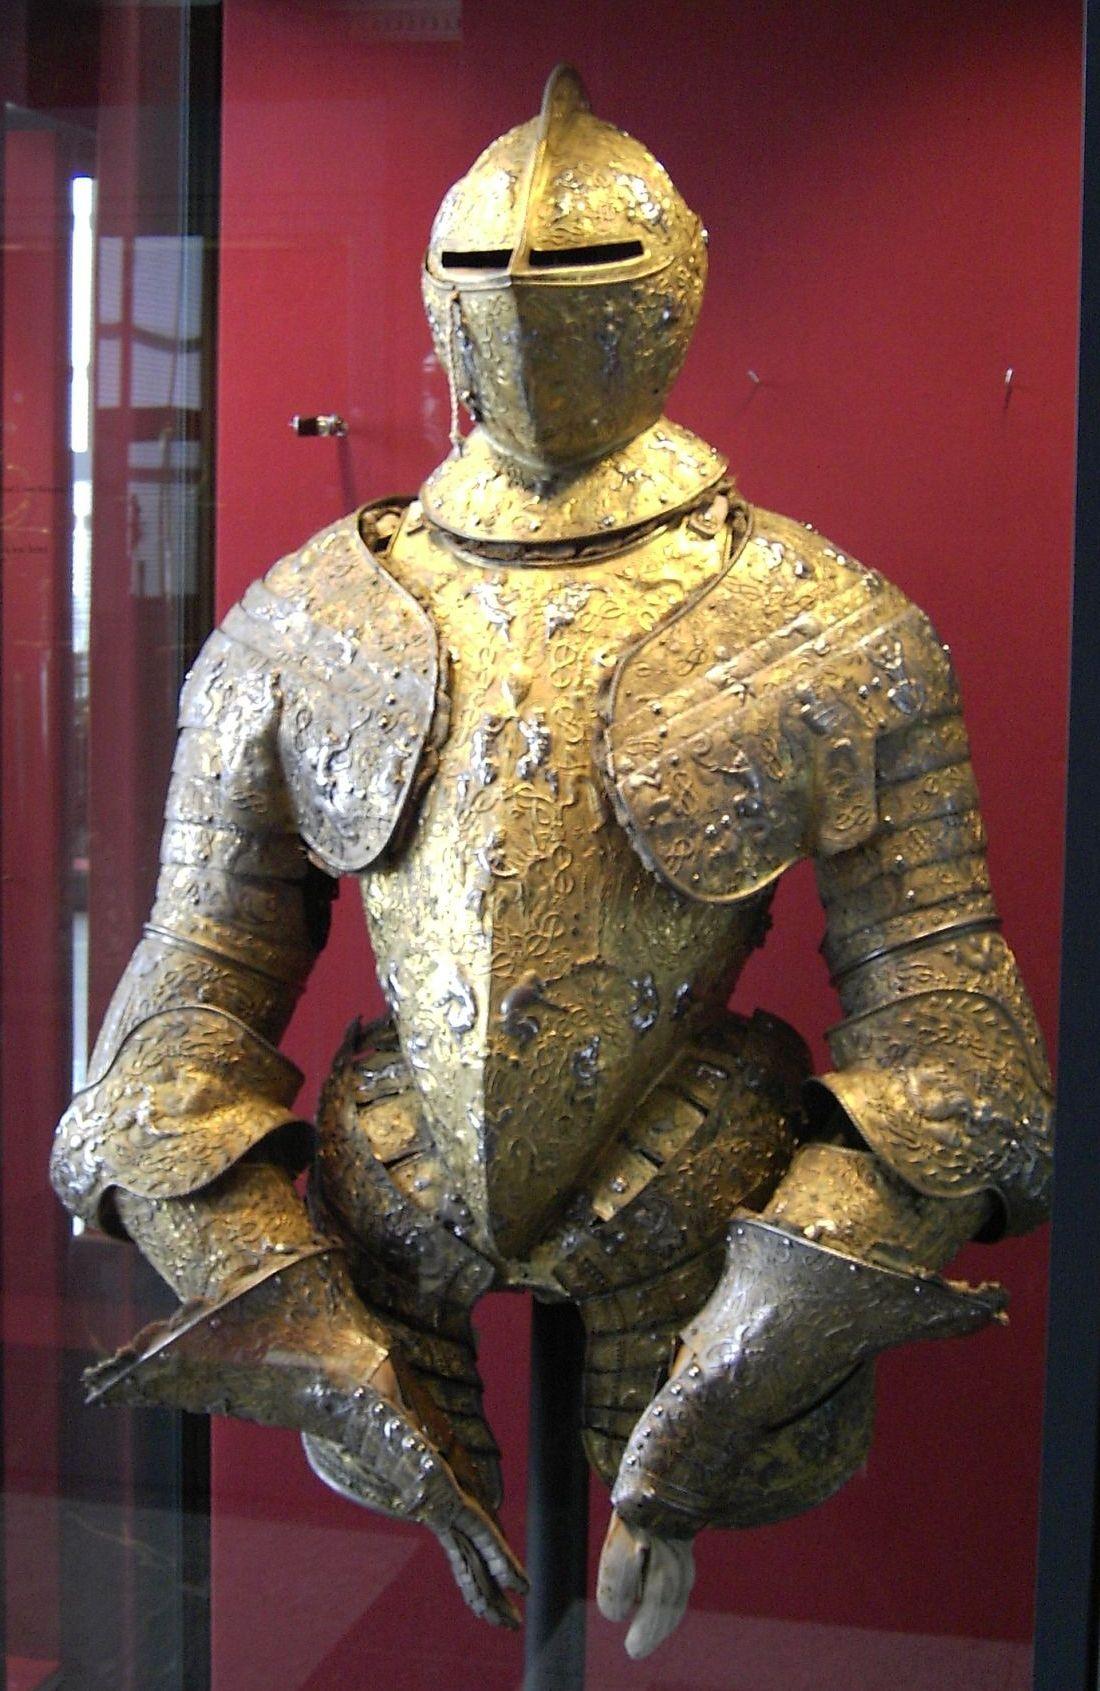 Dresden-Zwinger-Armoury-Armor